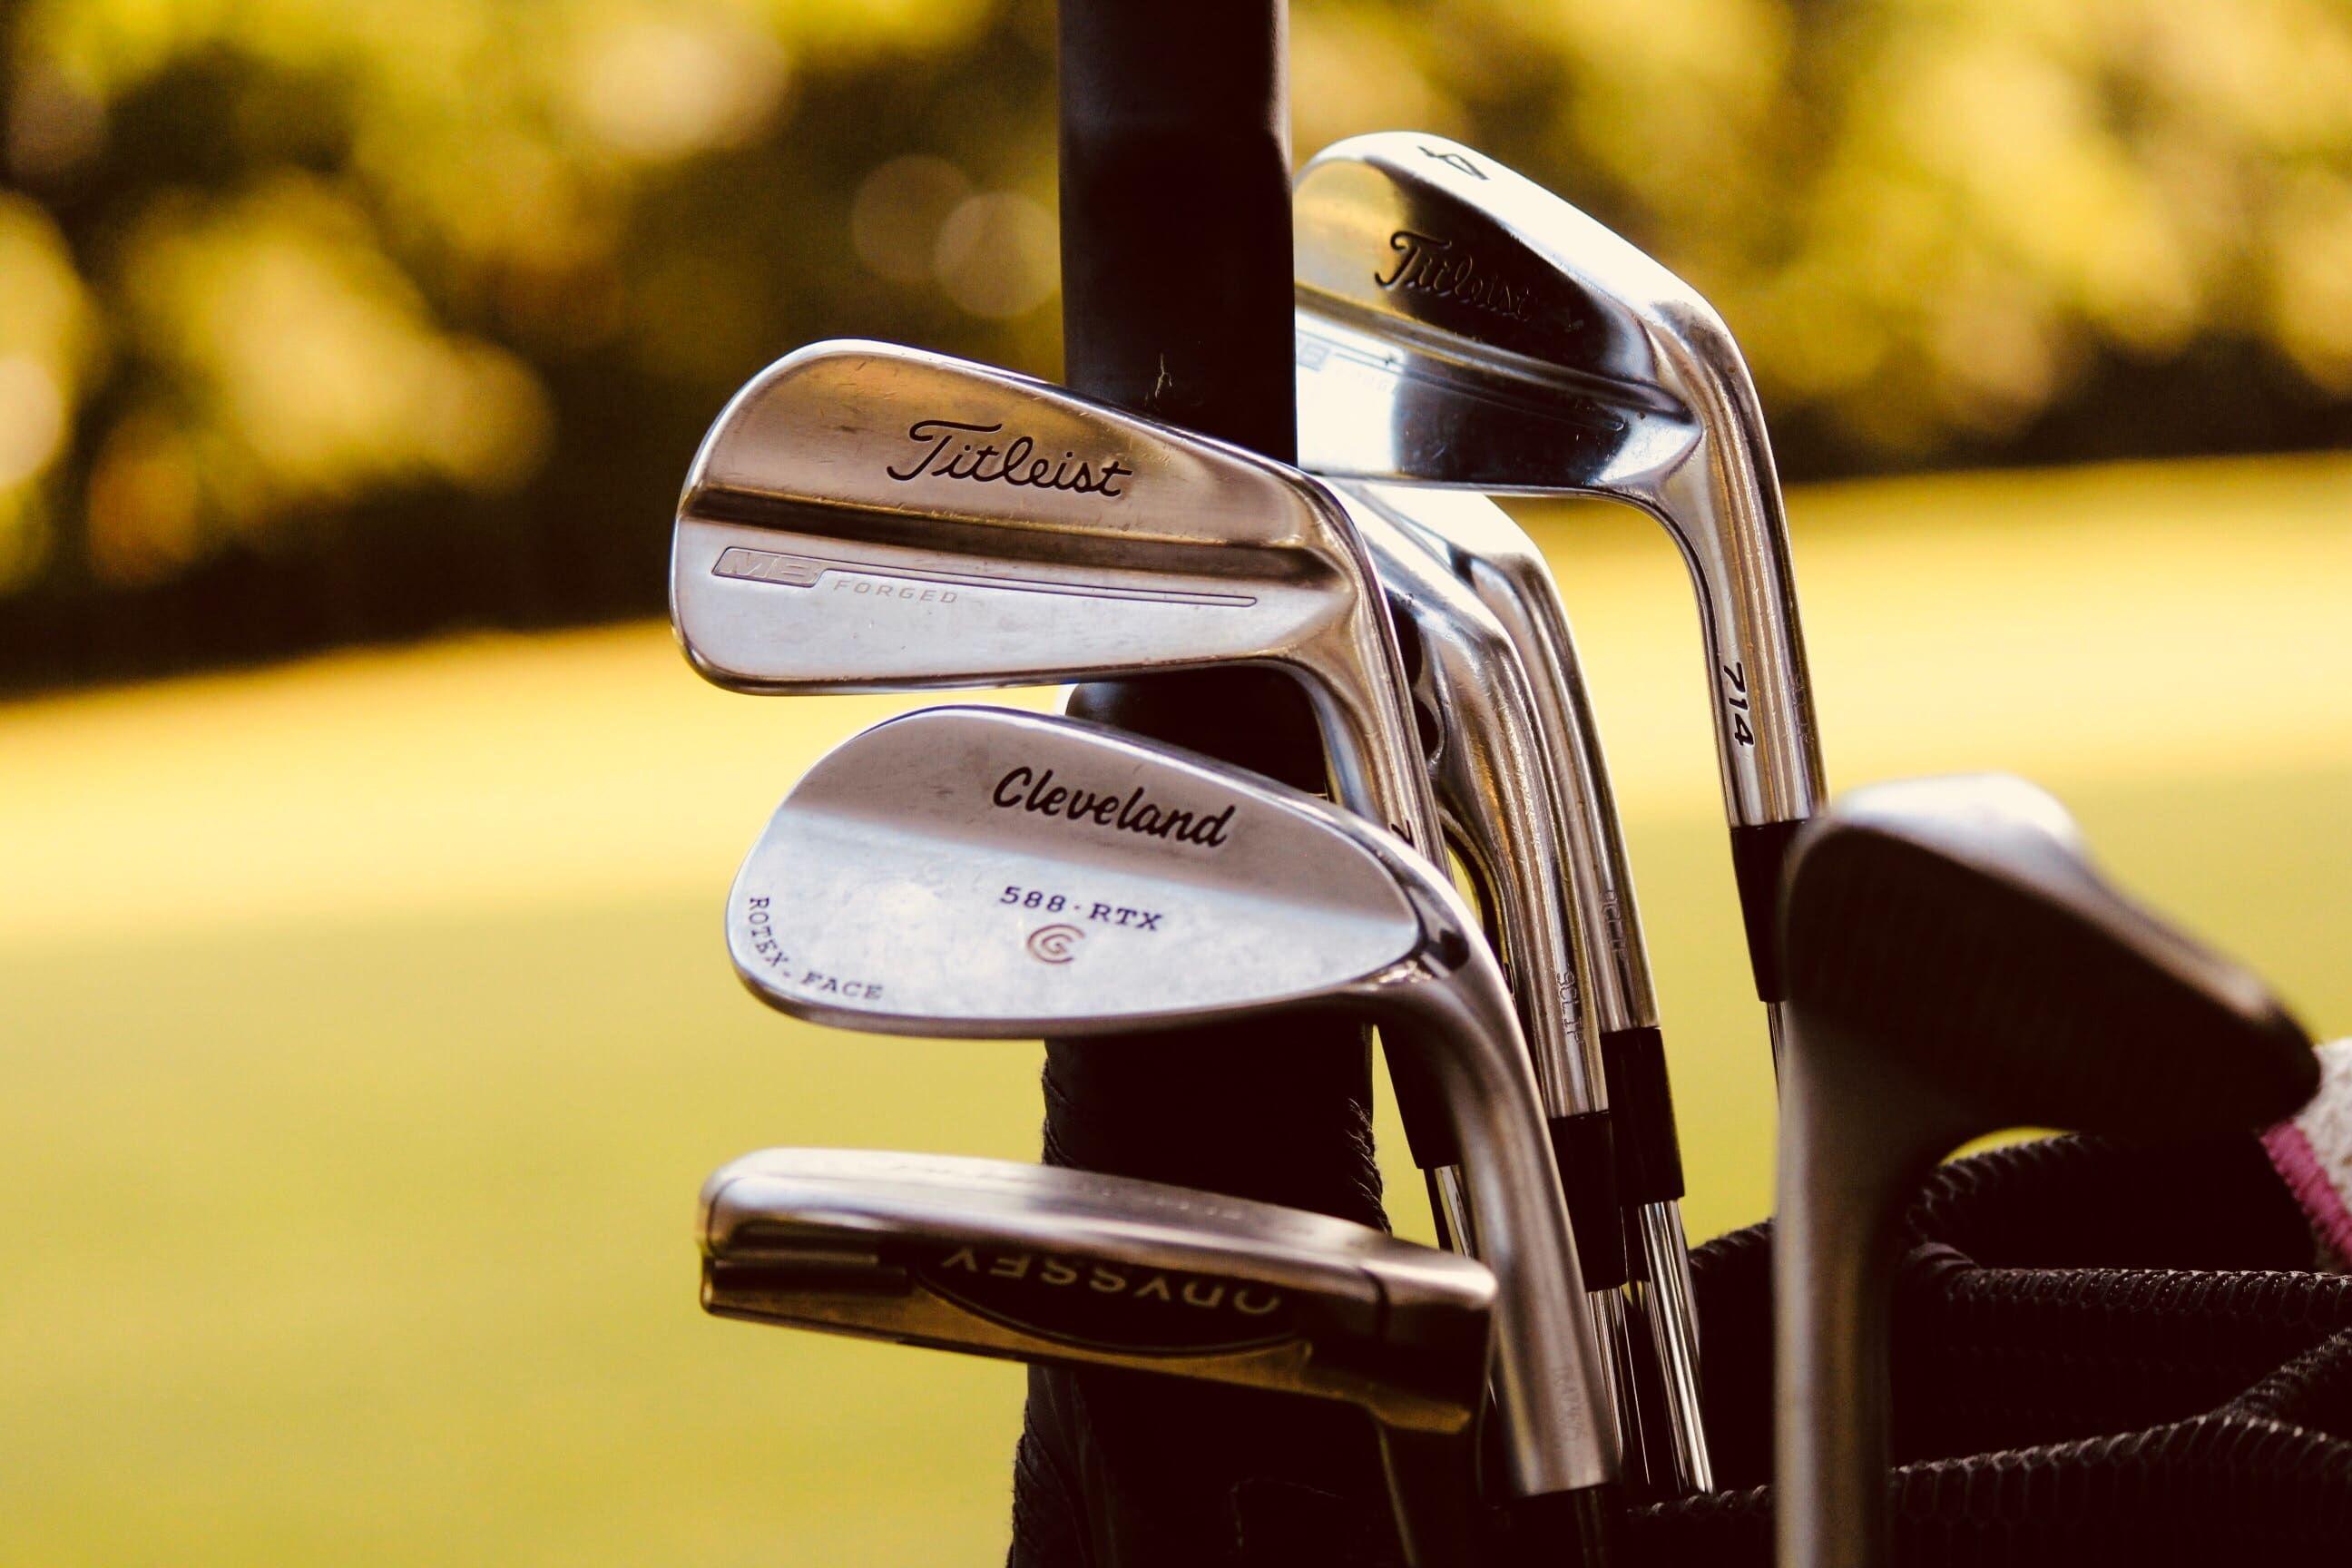 1. Japan WaZaki Black Oil Finish WL-IIs 4-SW Mx Steel Hybrid Irons Golf Club Set with Headcover